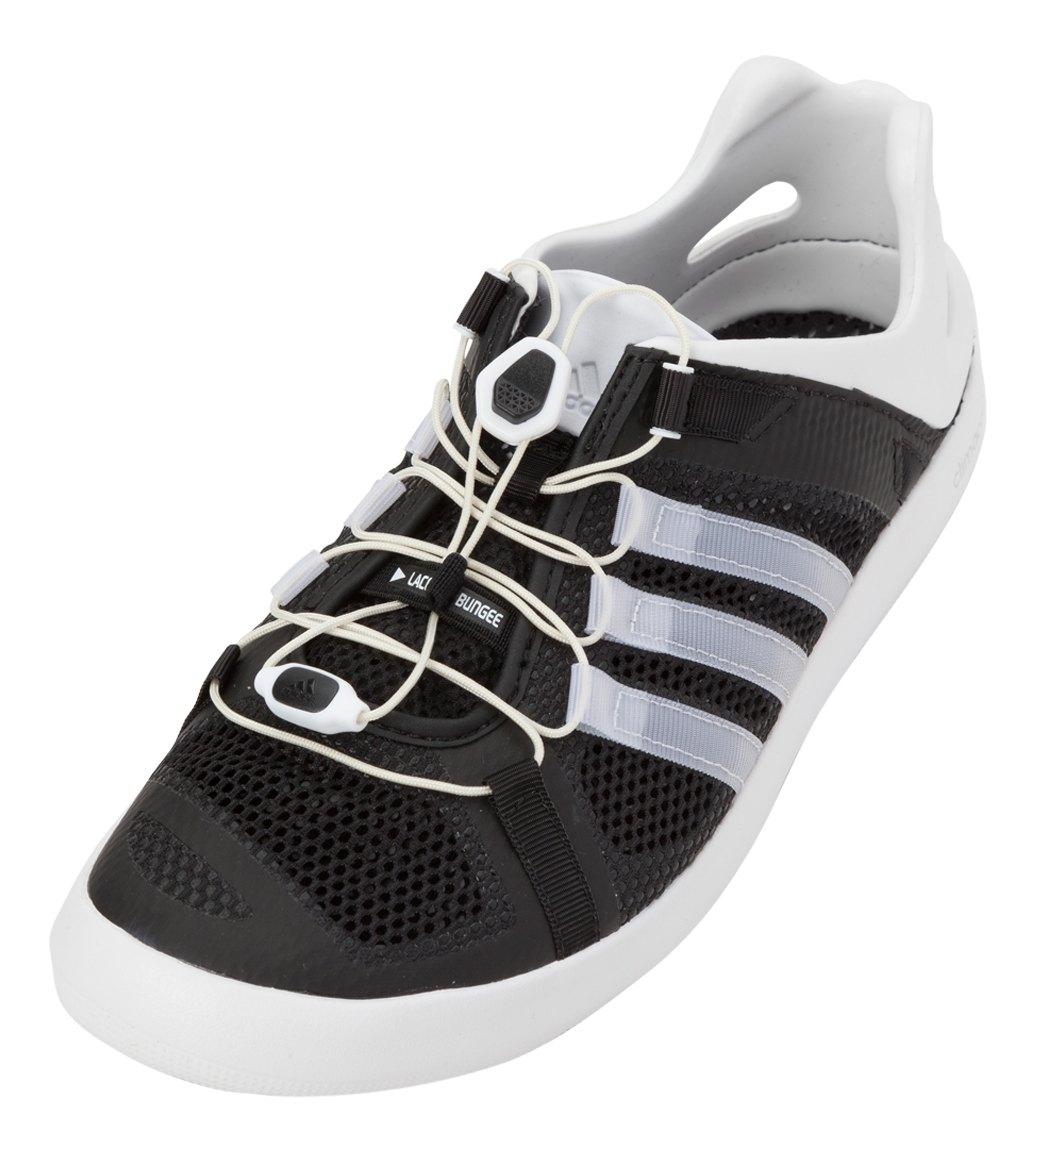 adidas climacool boat shoes